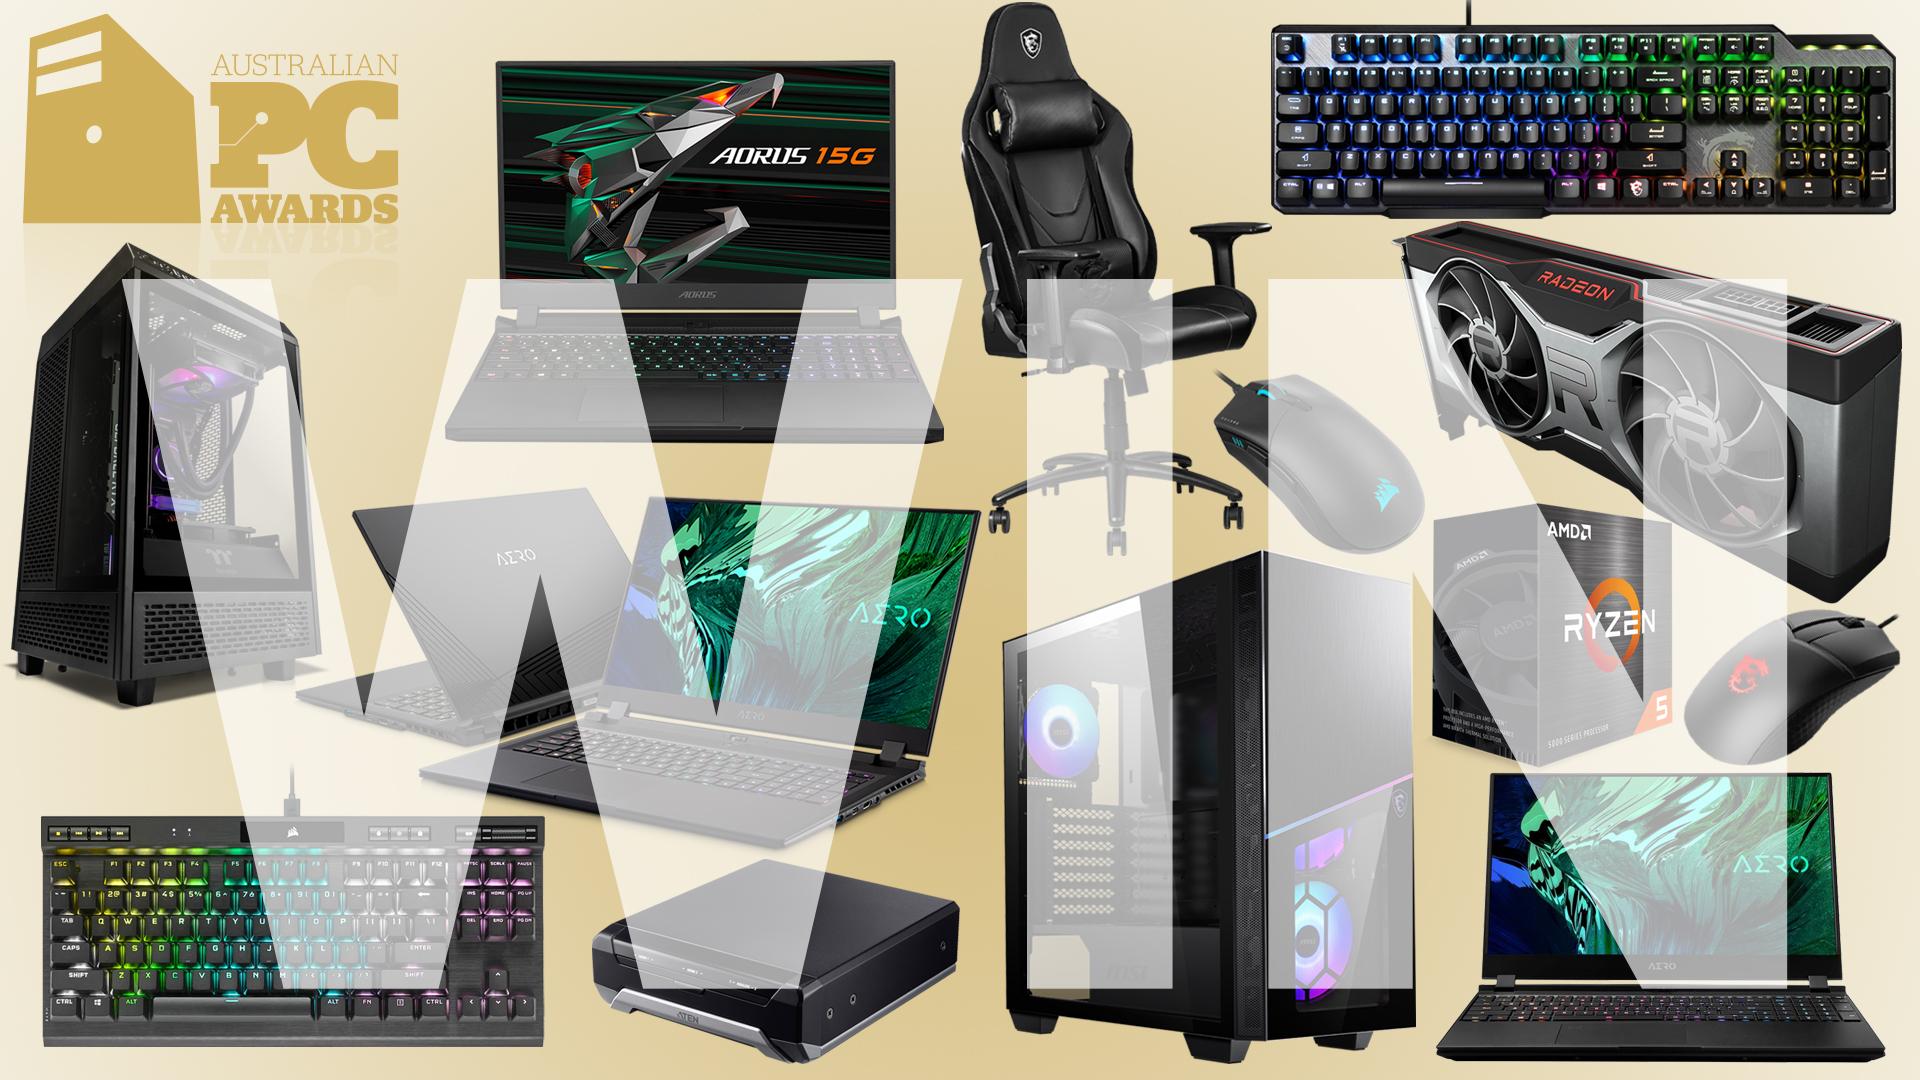 Australian PC awards